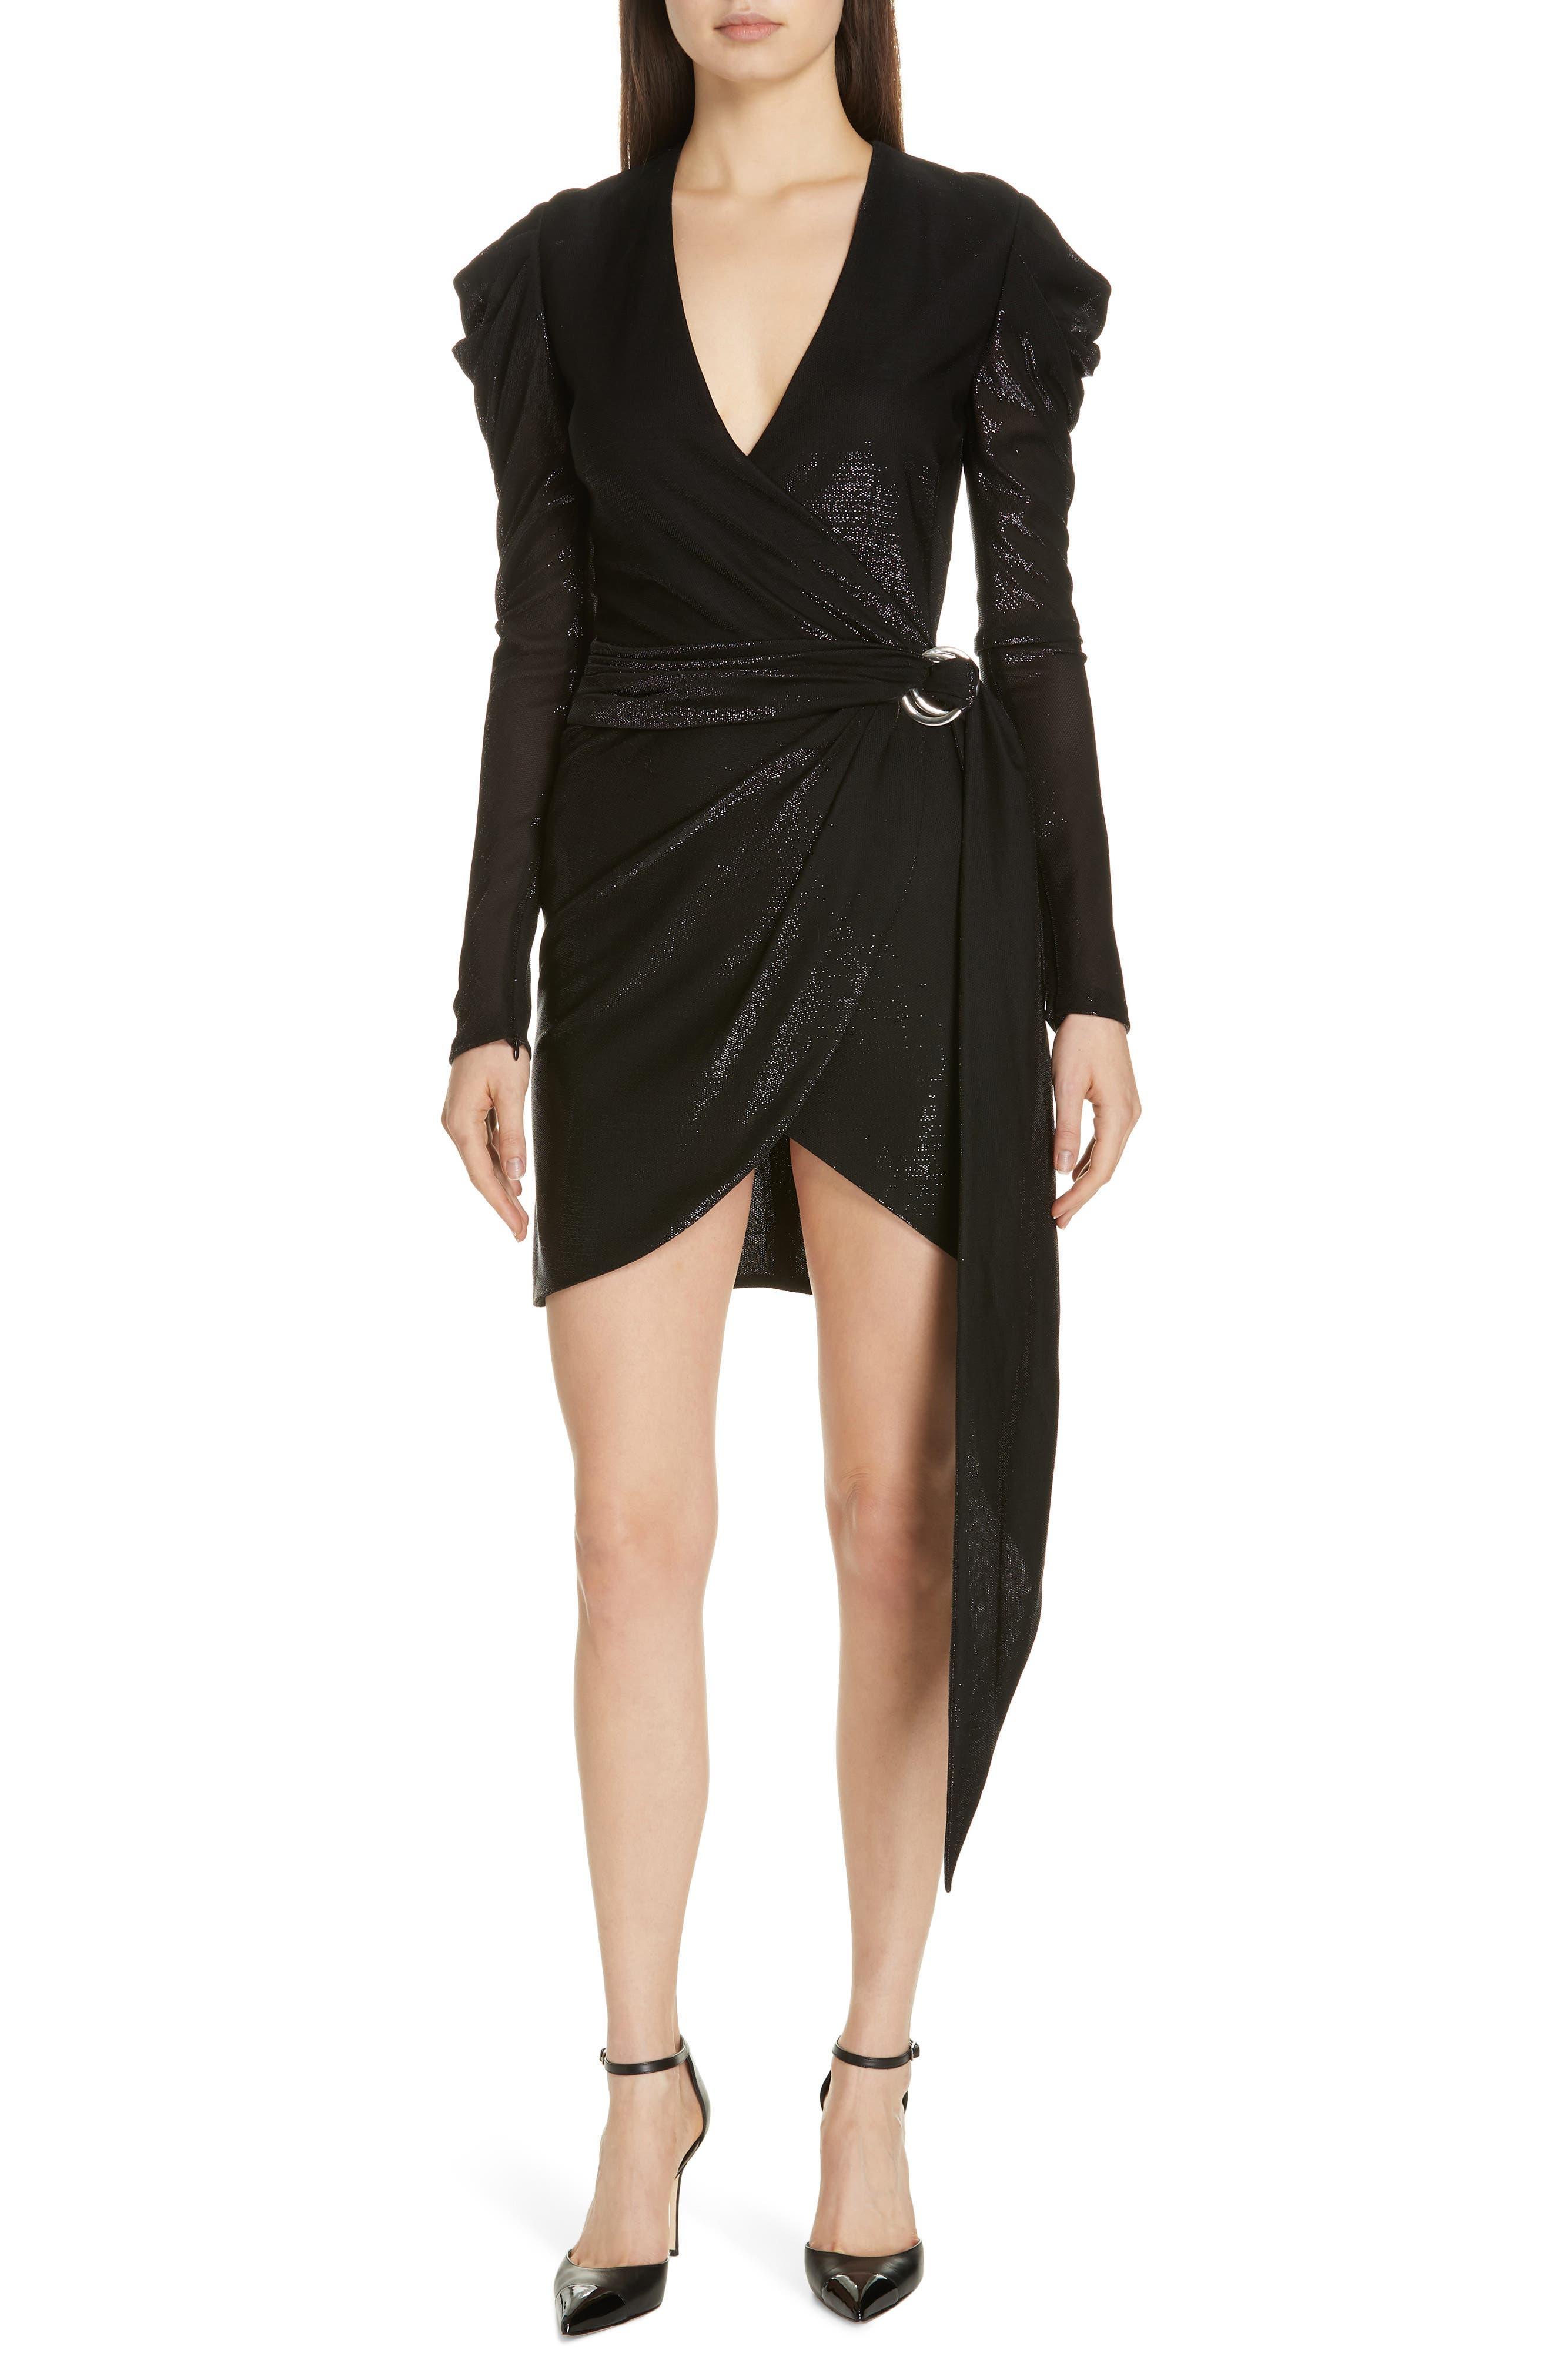 Jonathan Simkhai Metallic Knit Dress, Black